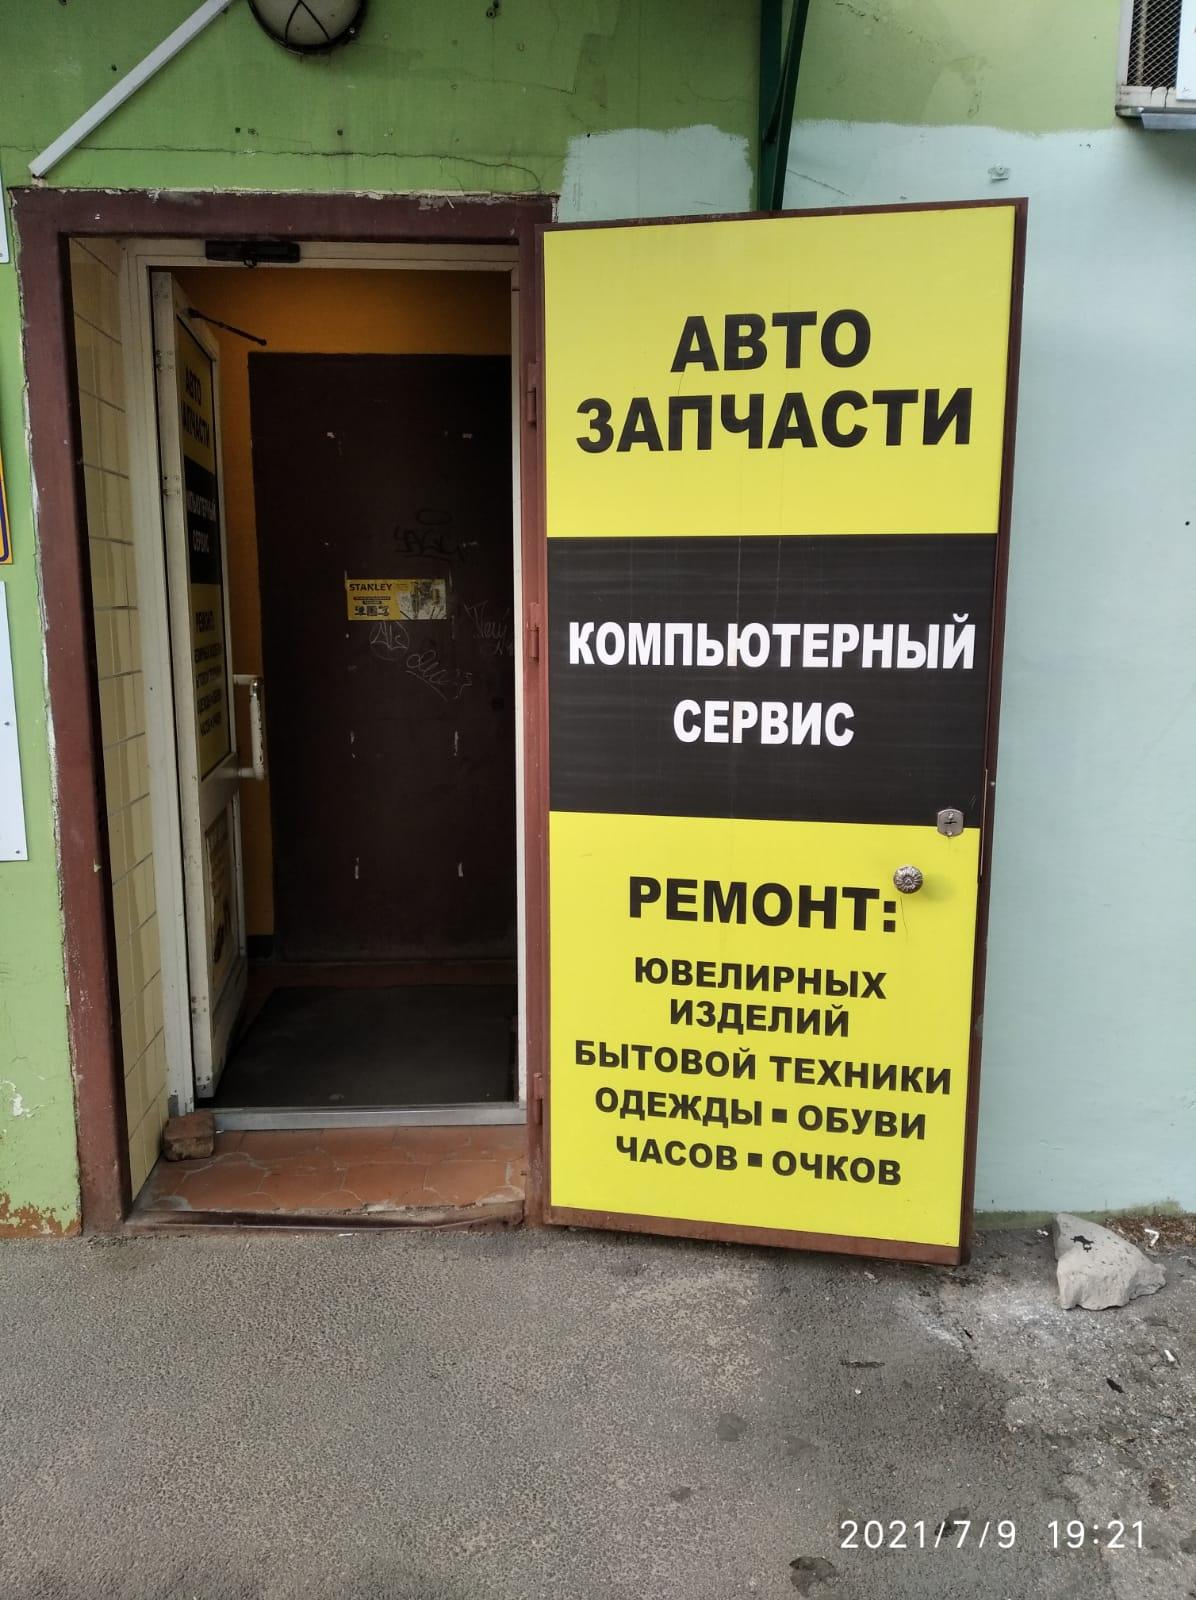 Пушкин, ул. Оранжерейная д. 60А ( Дом Быта )